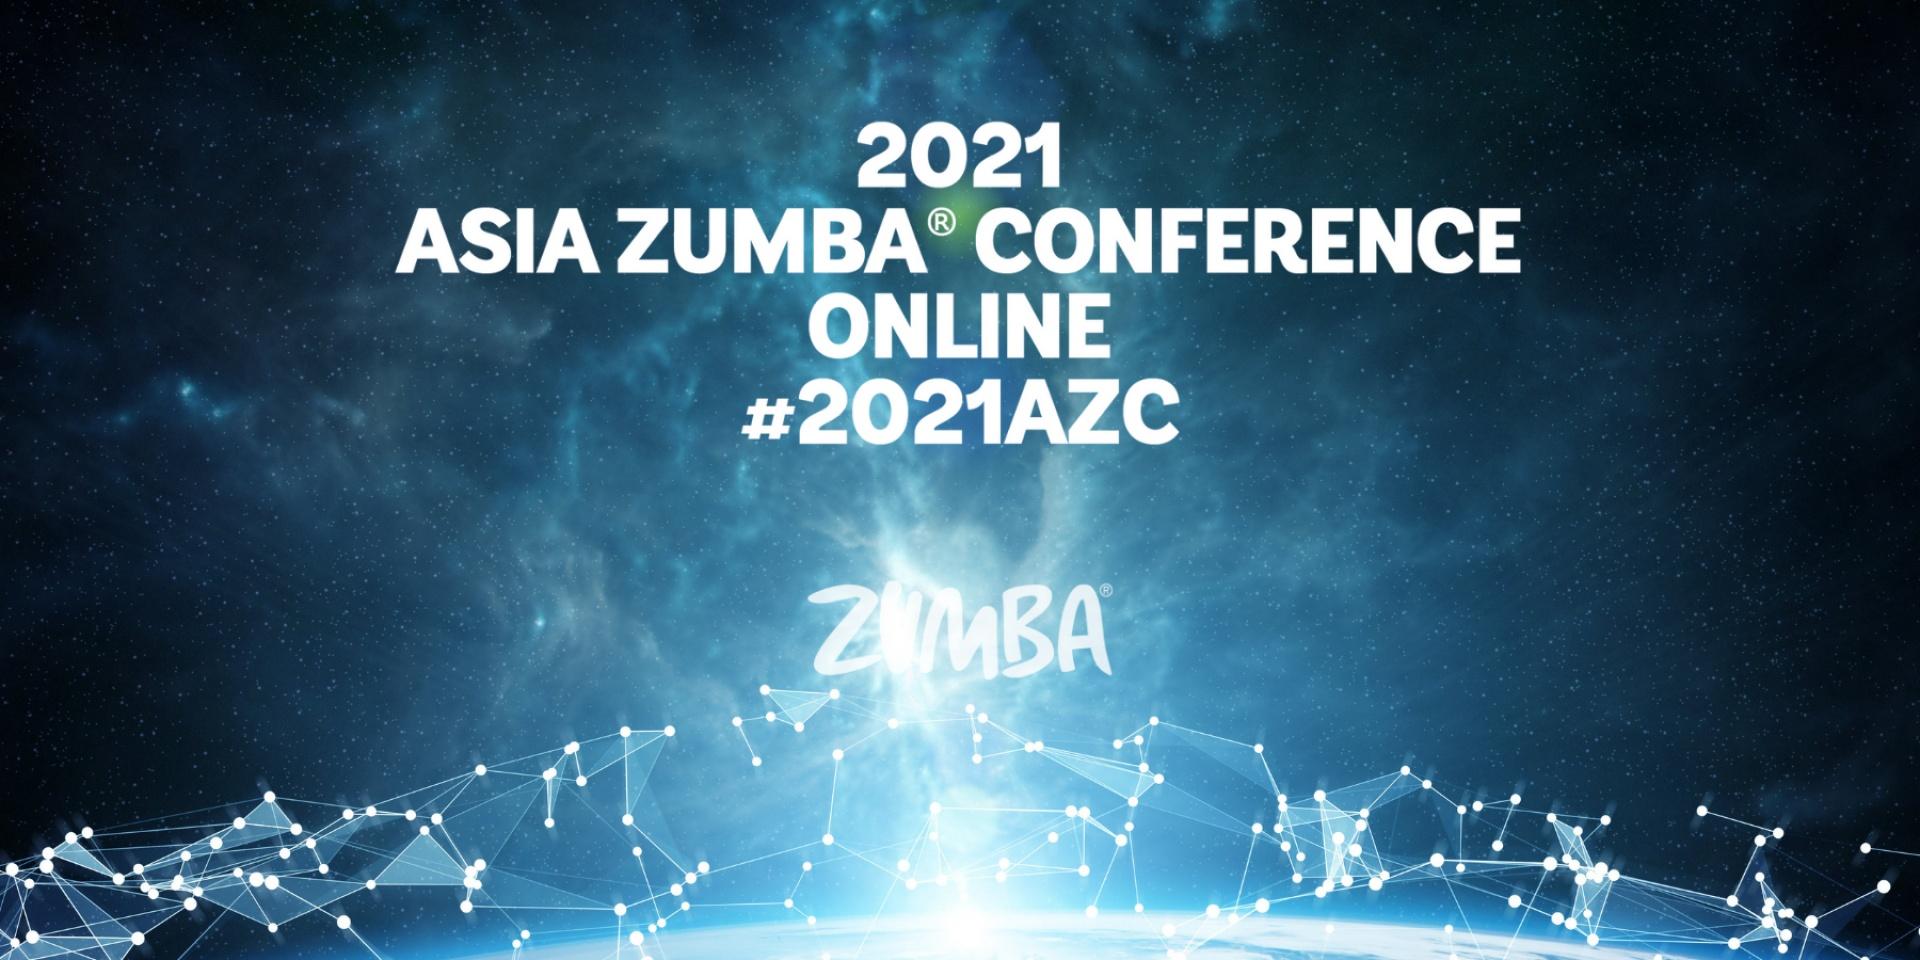 2021AZC